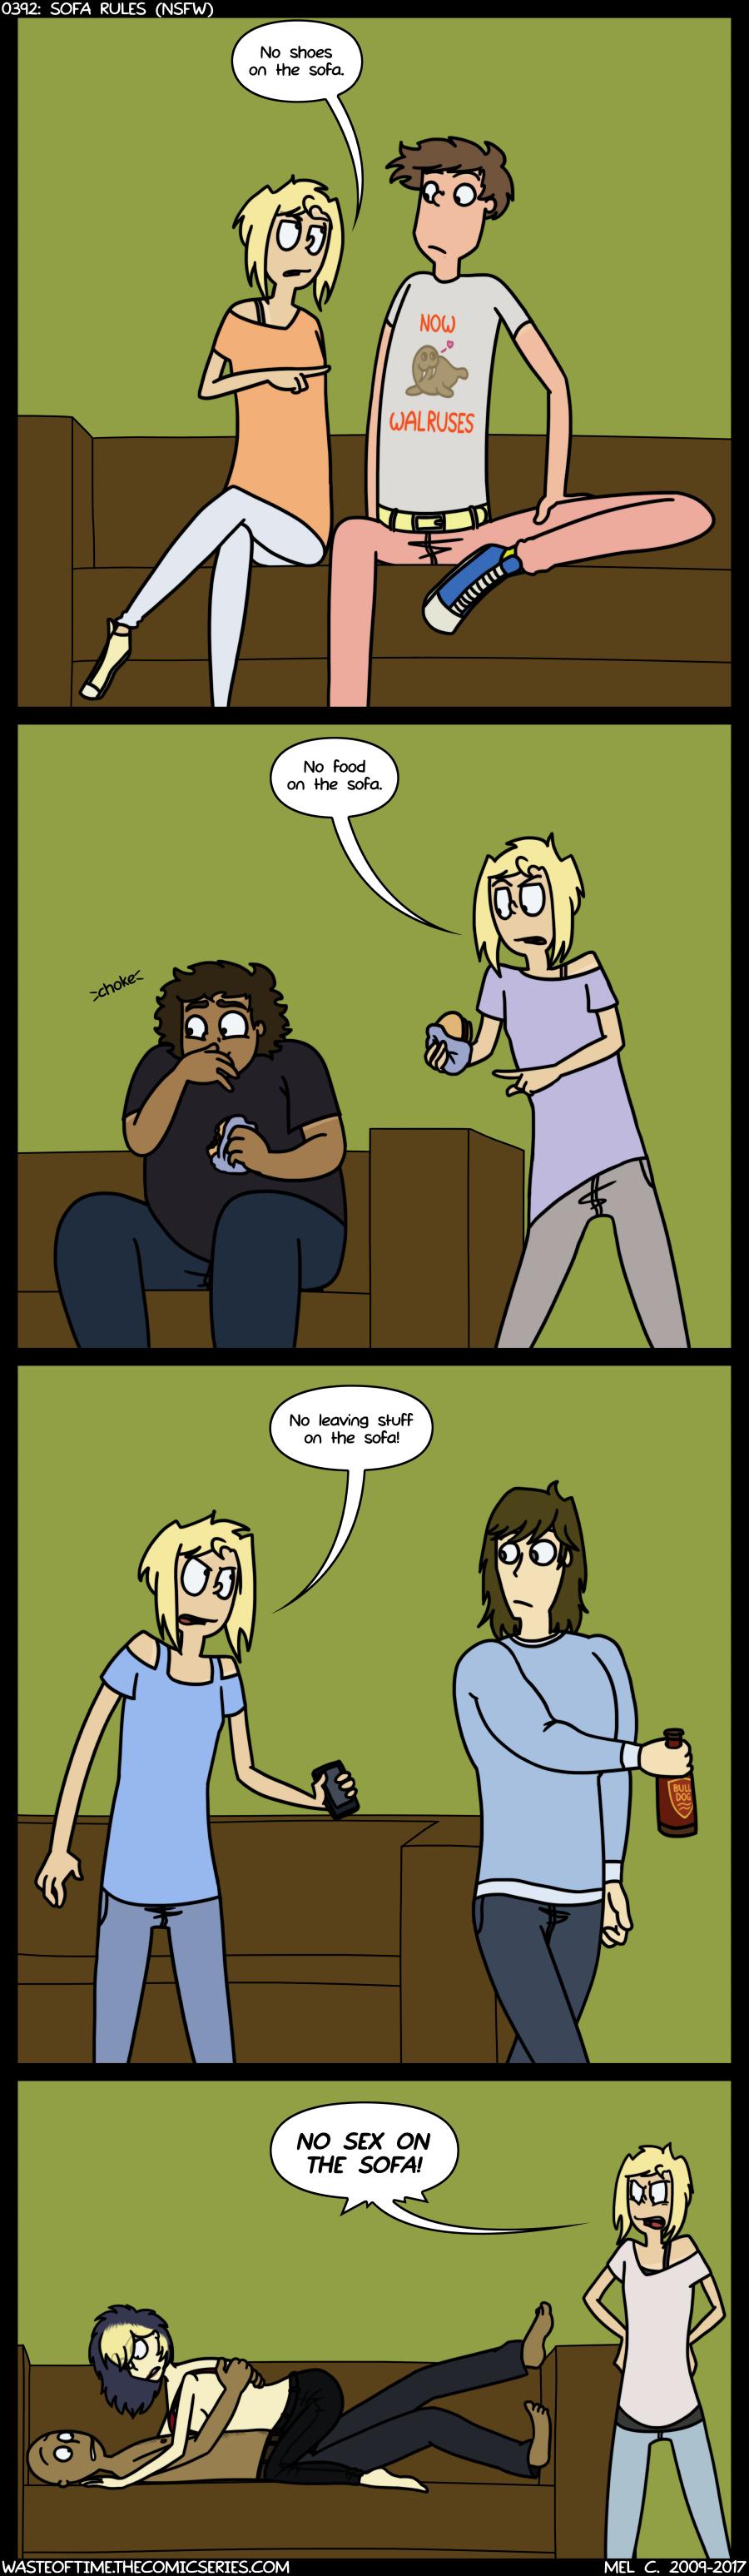 0392: Sofa Rules (NSFW)